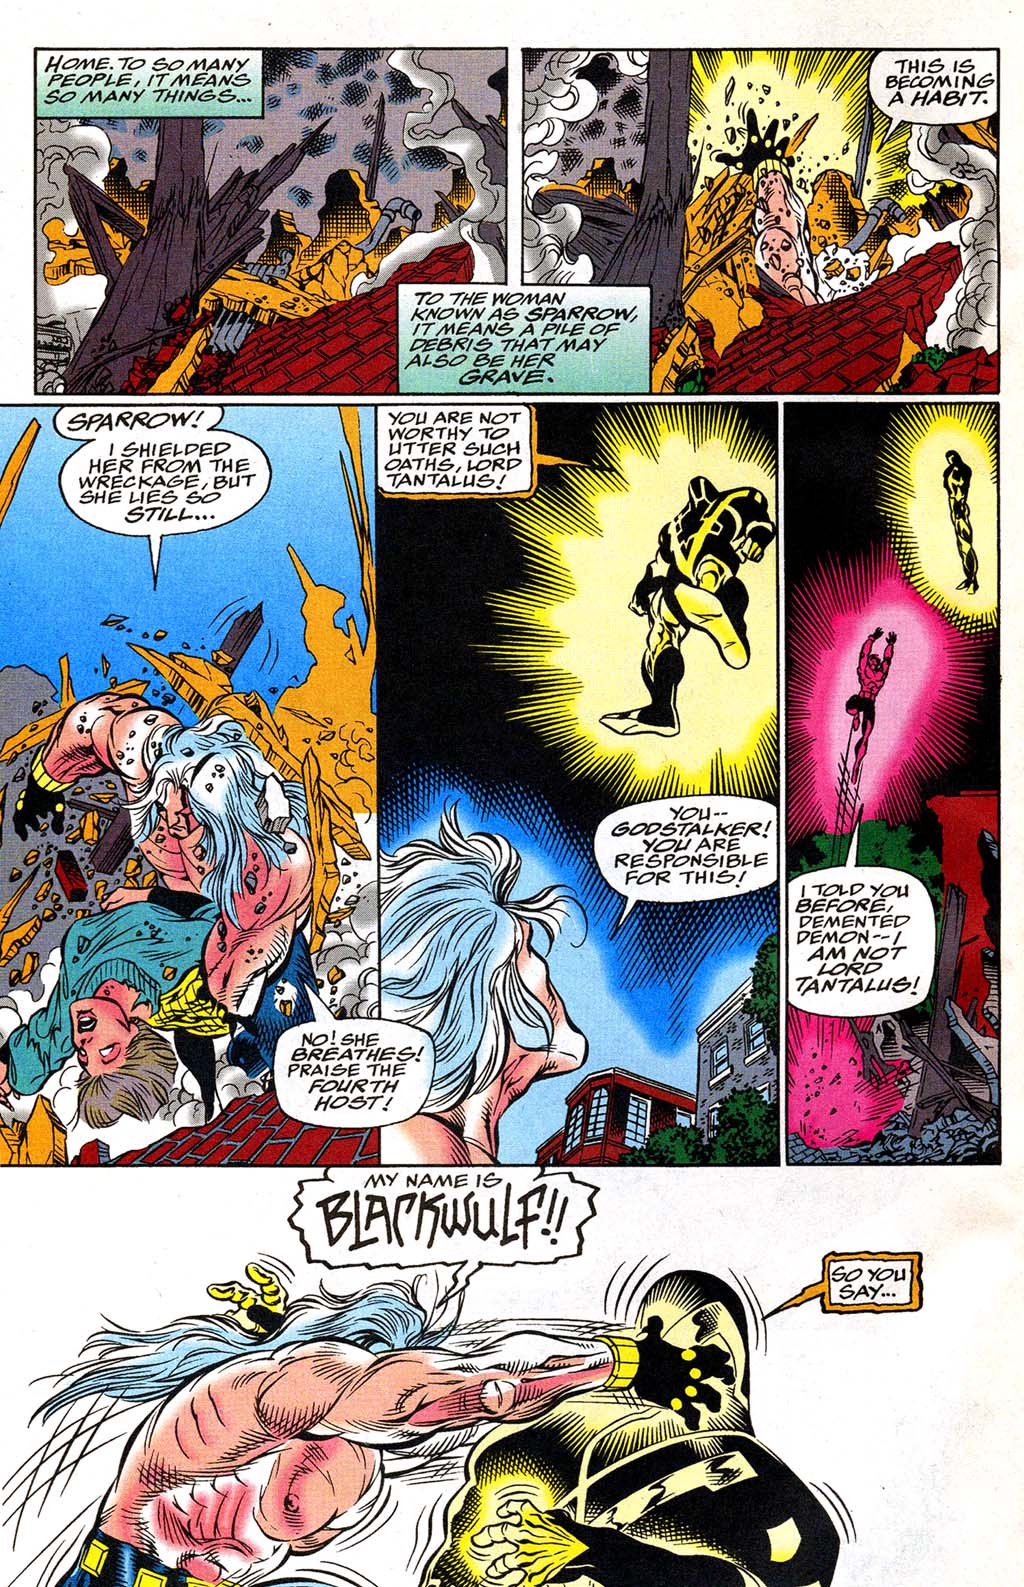 Read online Blackwulf comic -  Issue #8 - 4